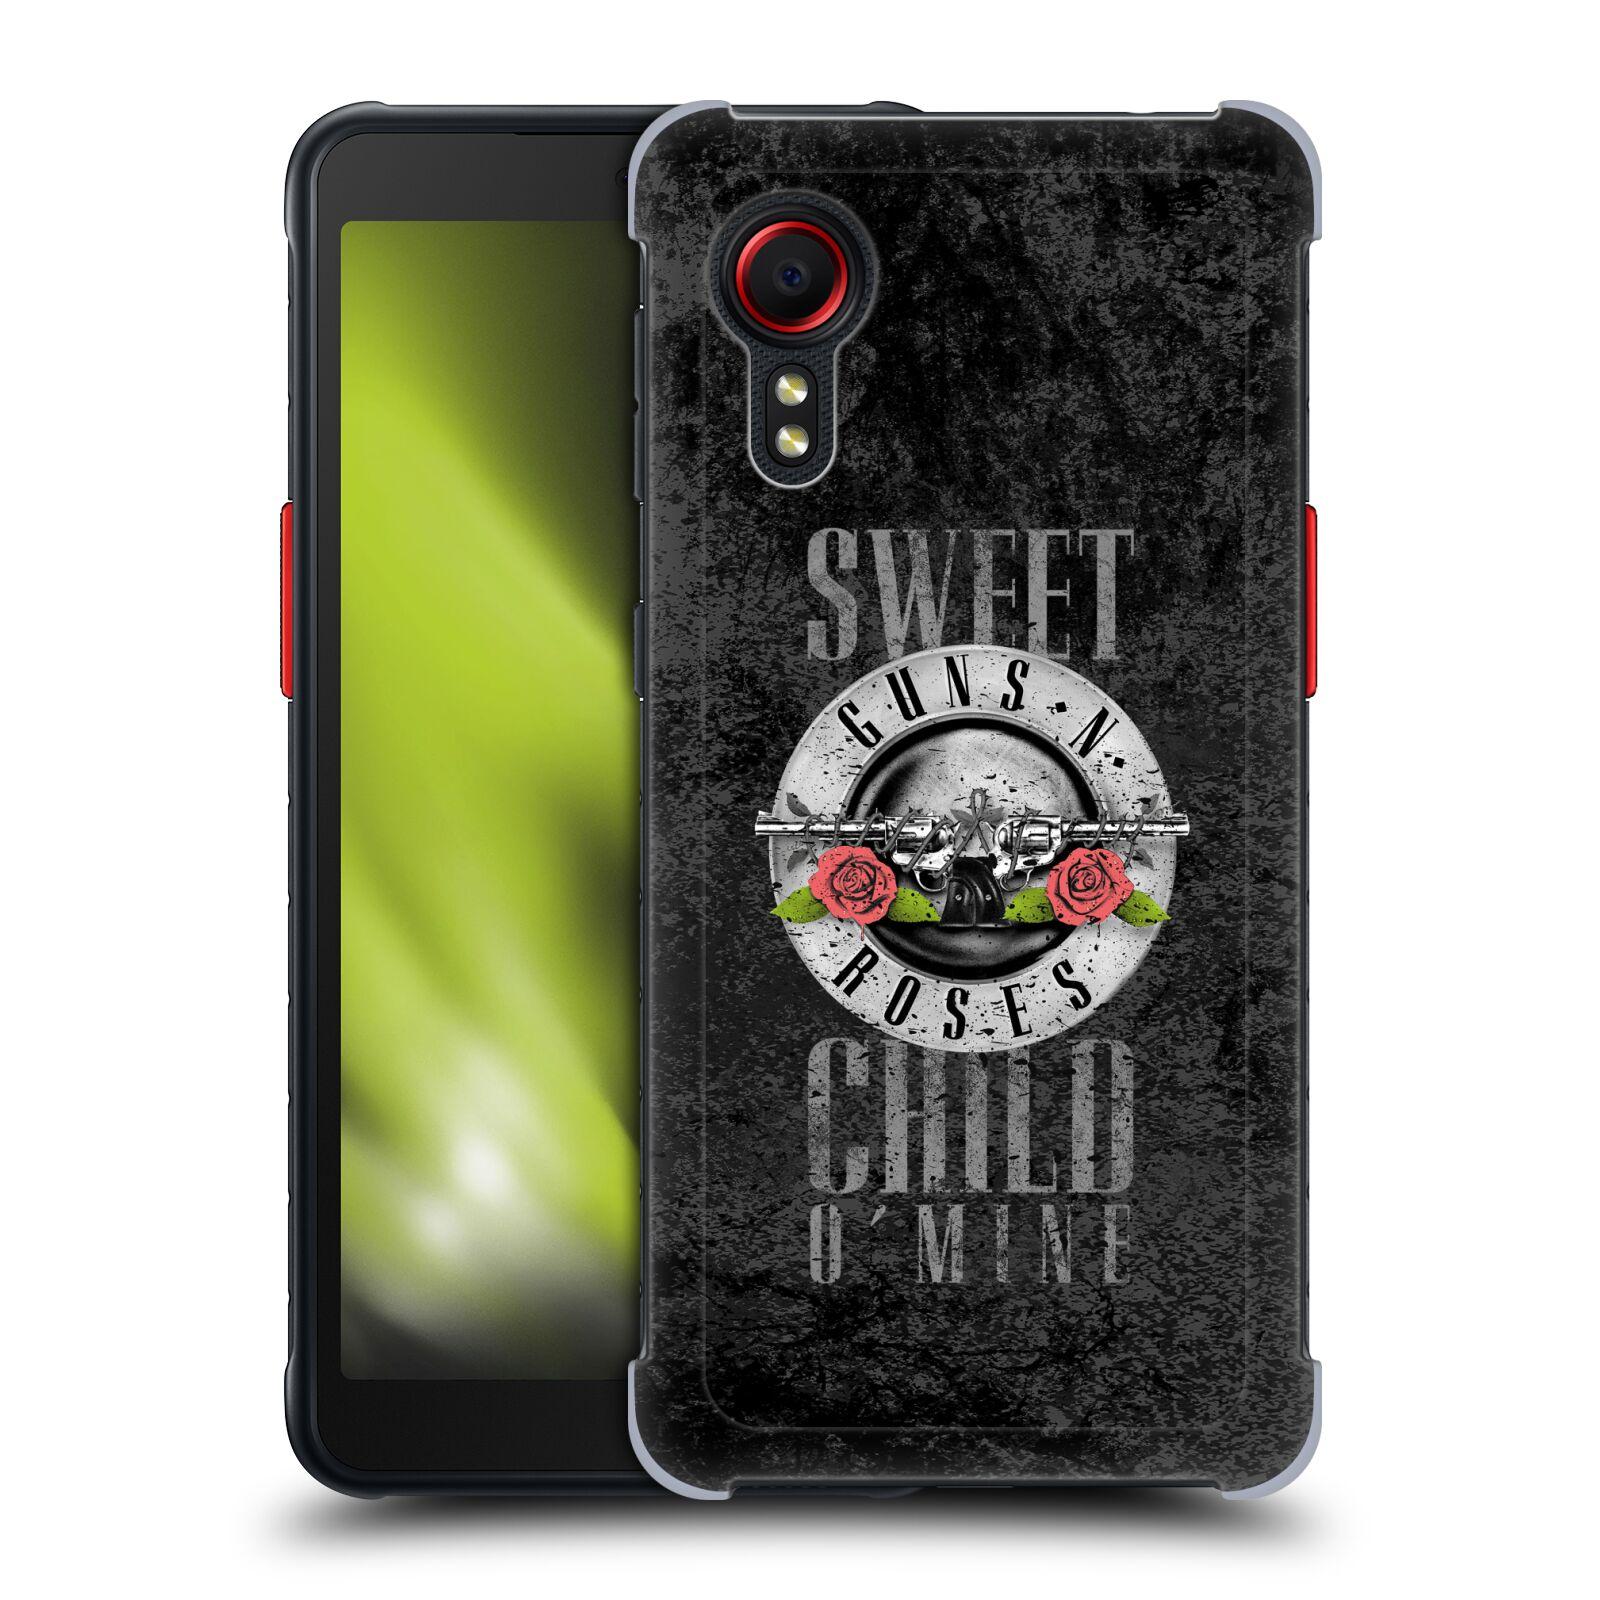 Plastové pouzdro na mobil Samsung Galaxy Xcover 5 - Head Case - Guns N' Roses - Sweet Child